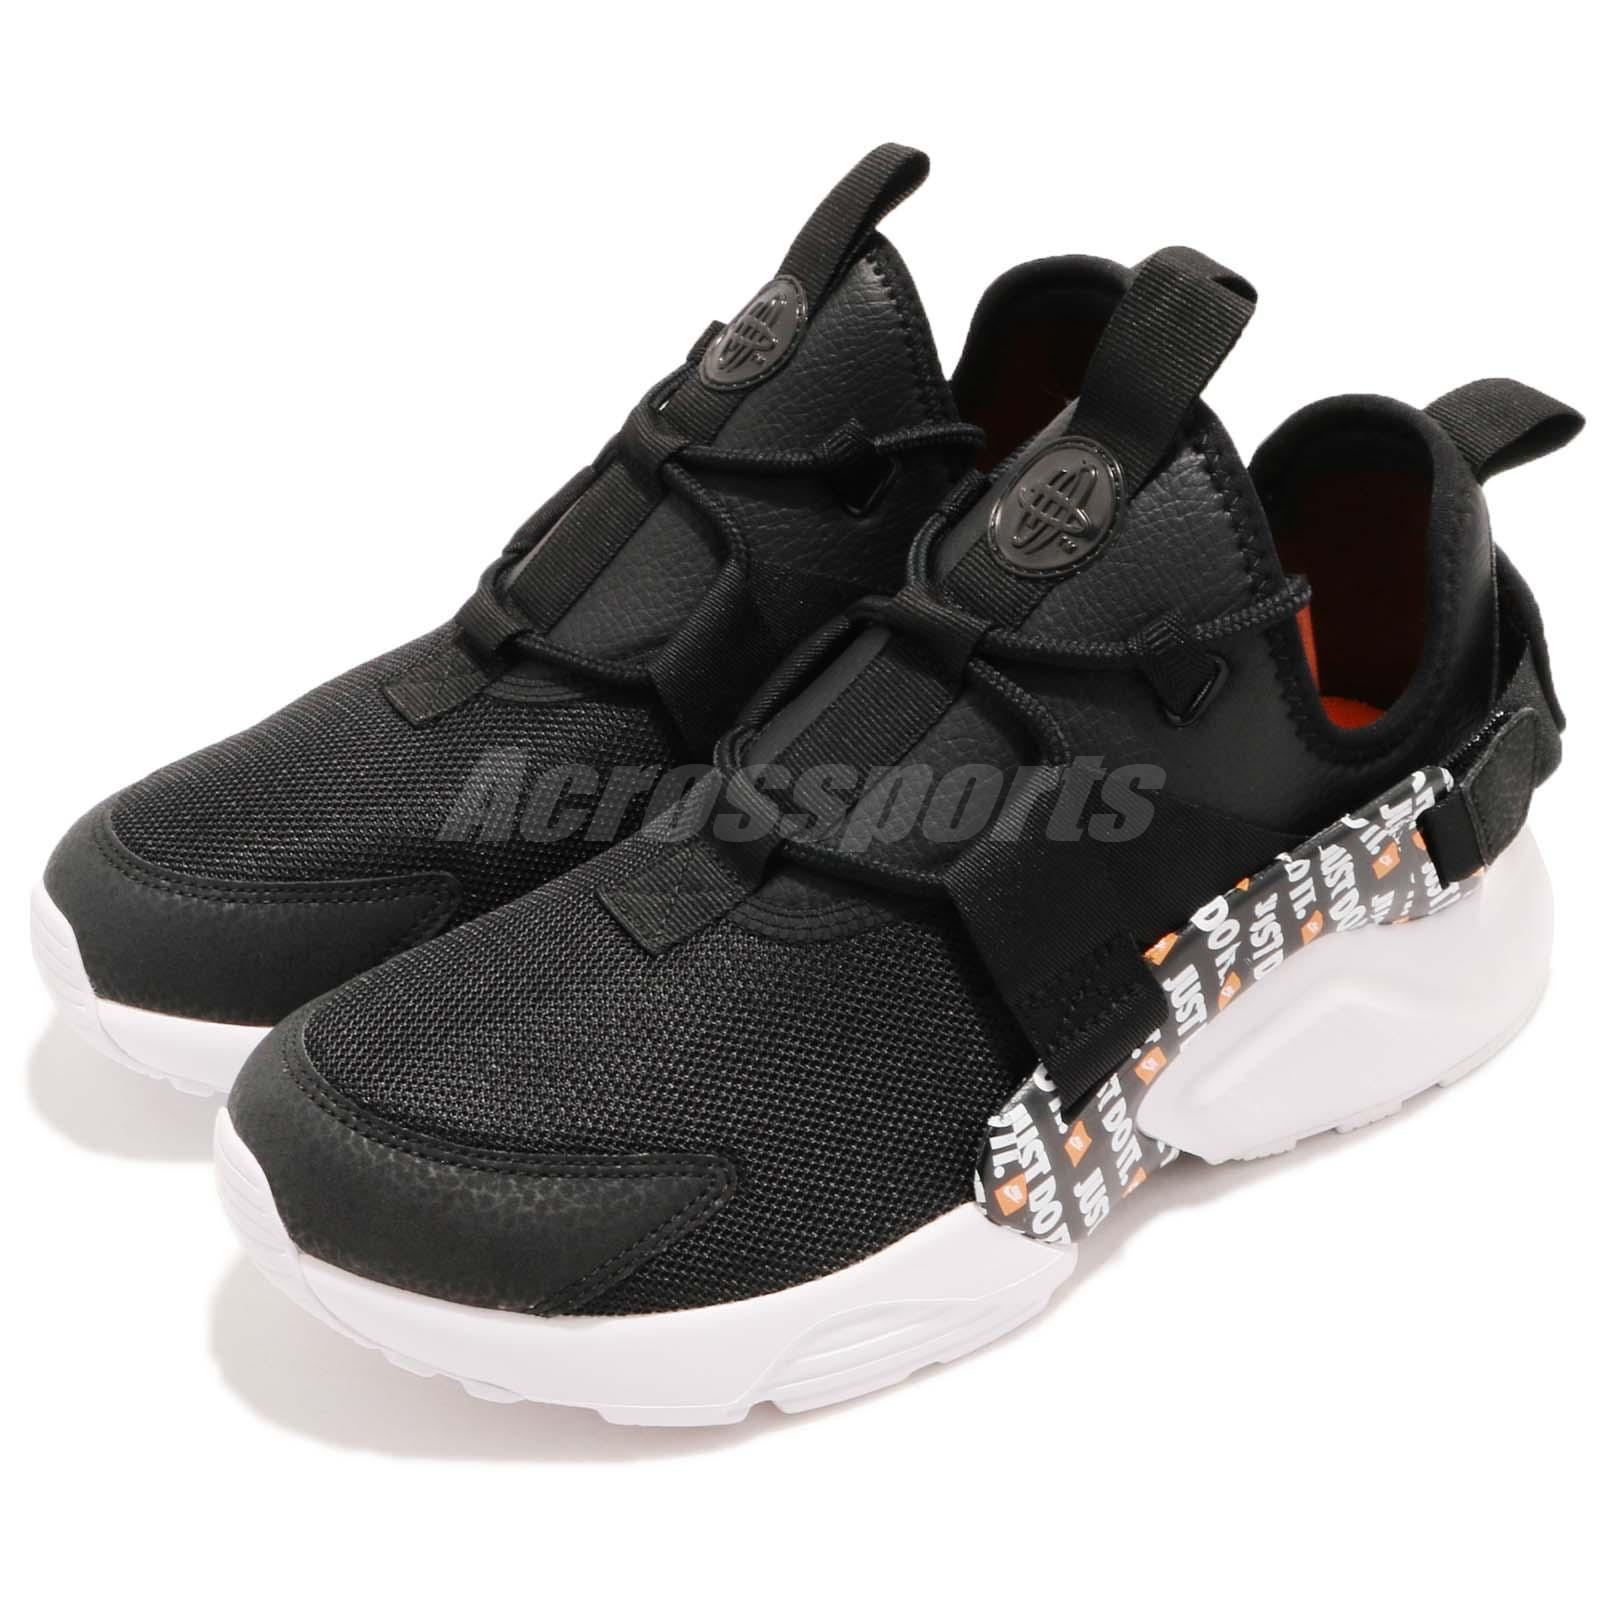 Details about Nike Wmns Air Huarache City Low PRM Just Do It JDI Black White Women AO3140 001